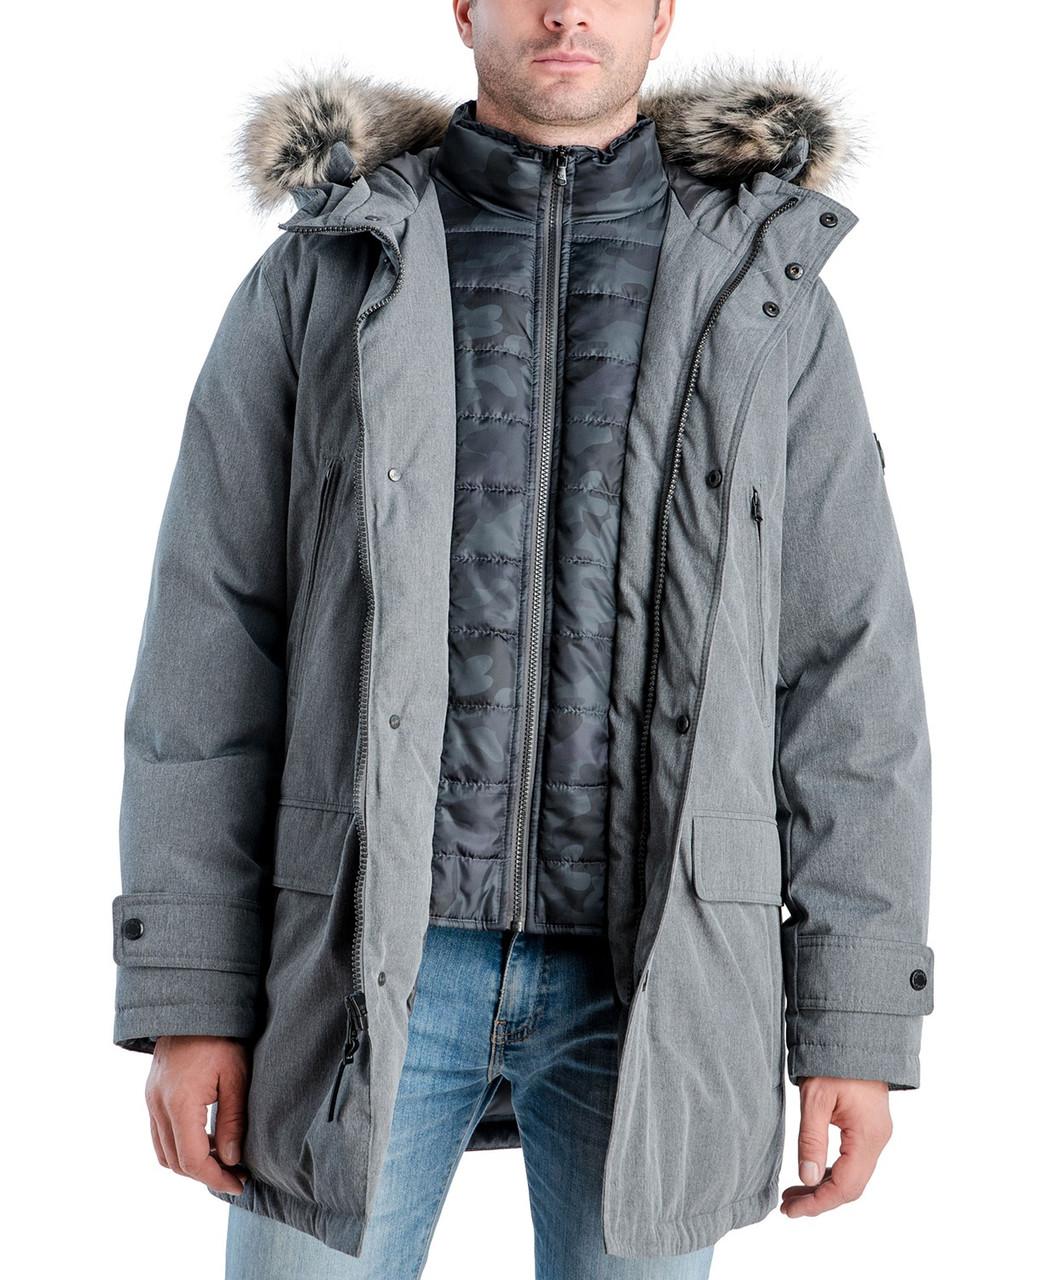 Очень Теплая зимняя мужская куртка парка Michael Kors Майкл Корс (Размер XL) Оригинал